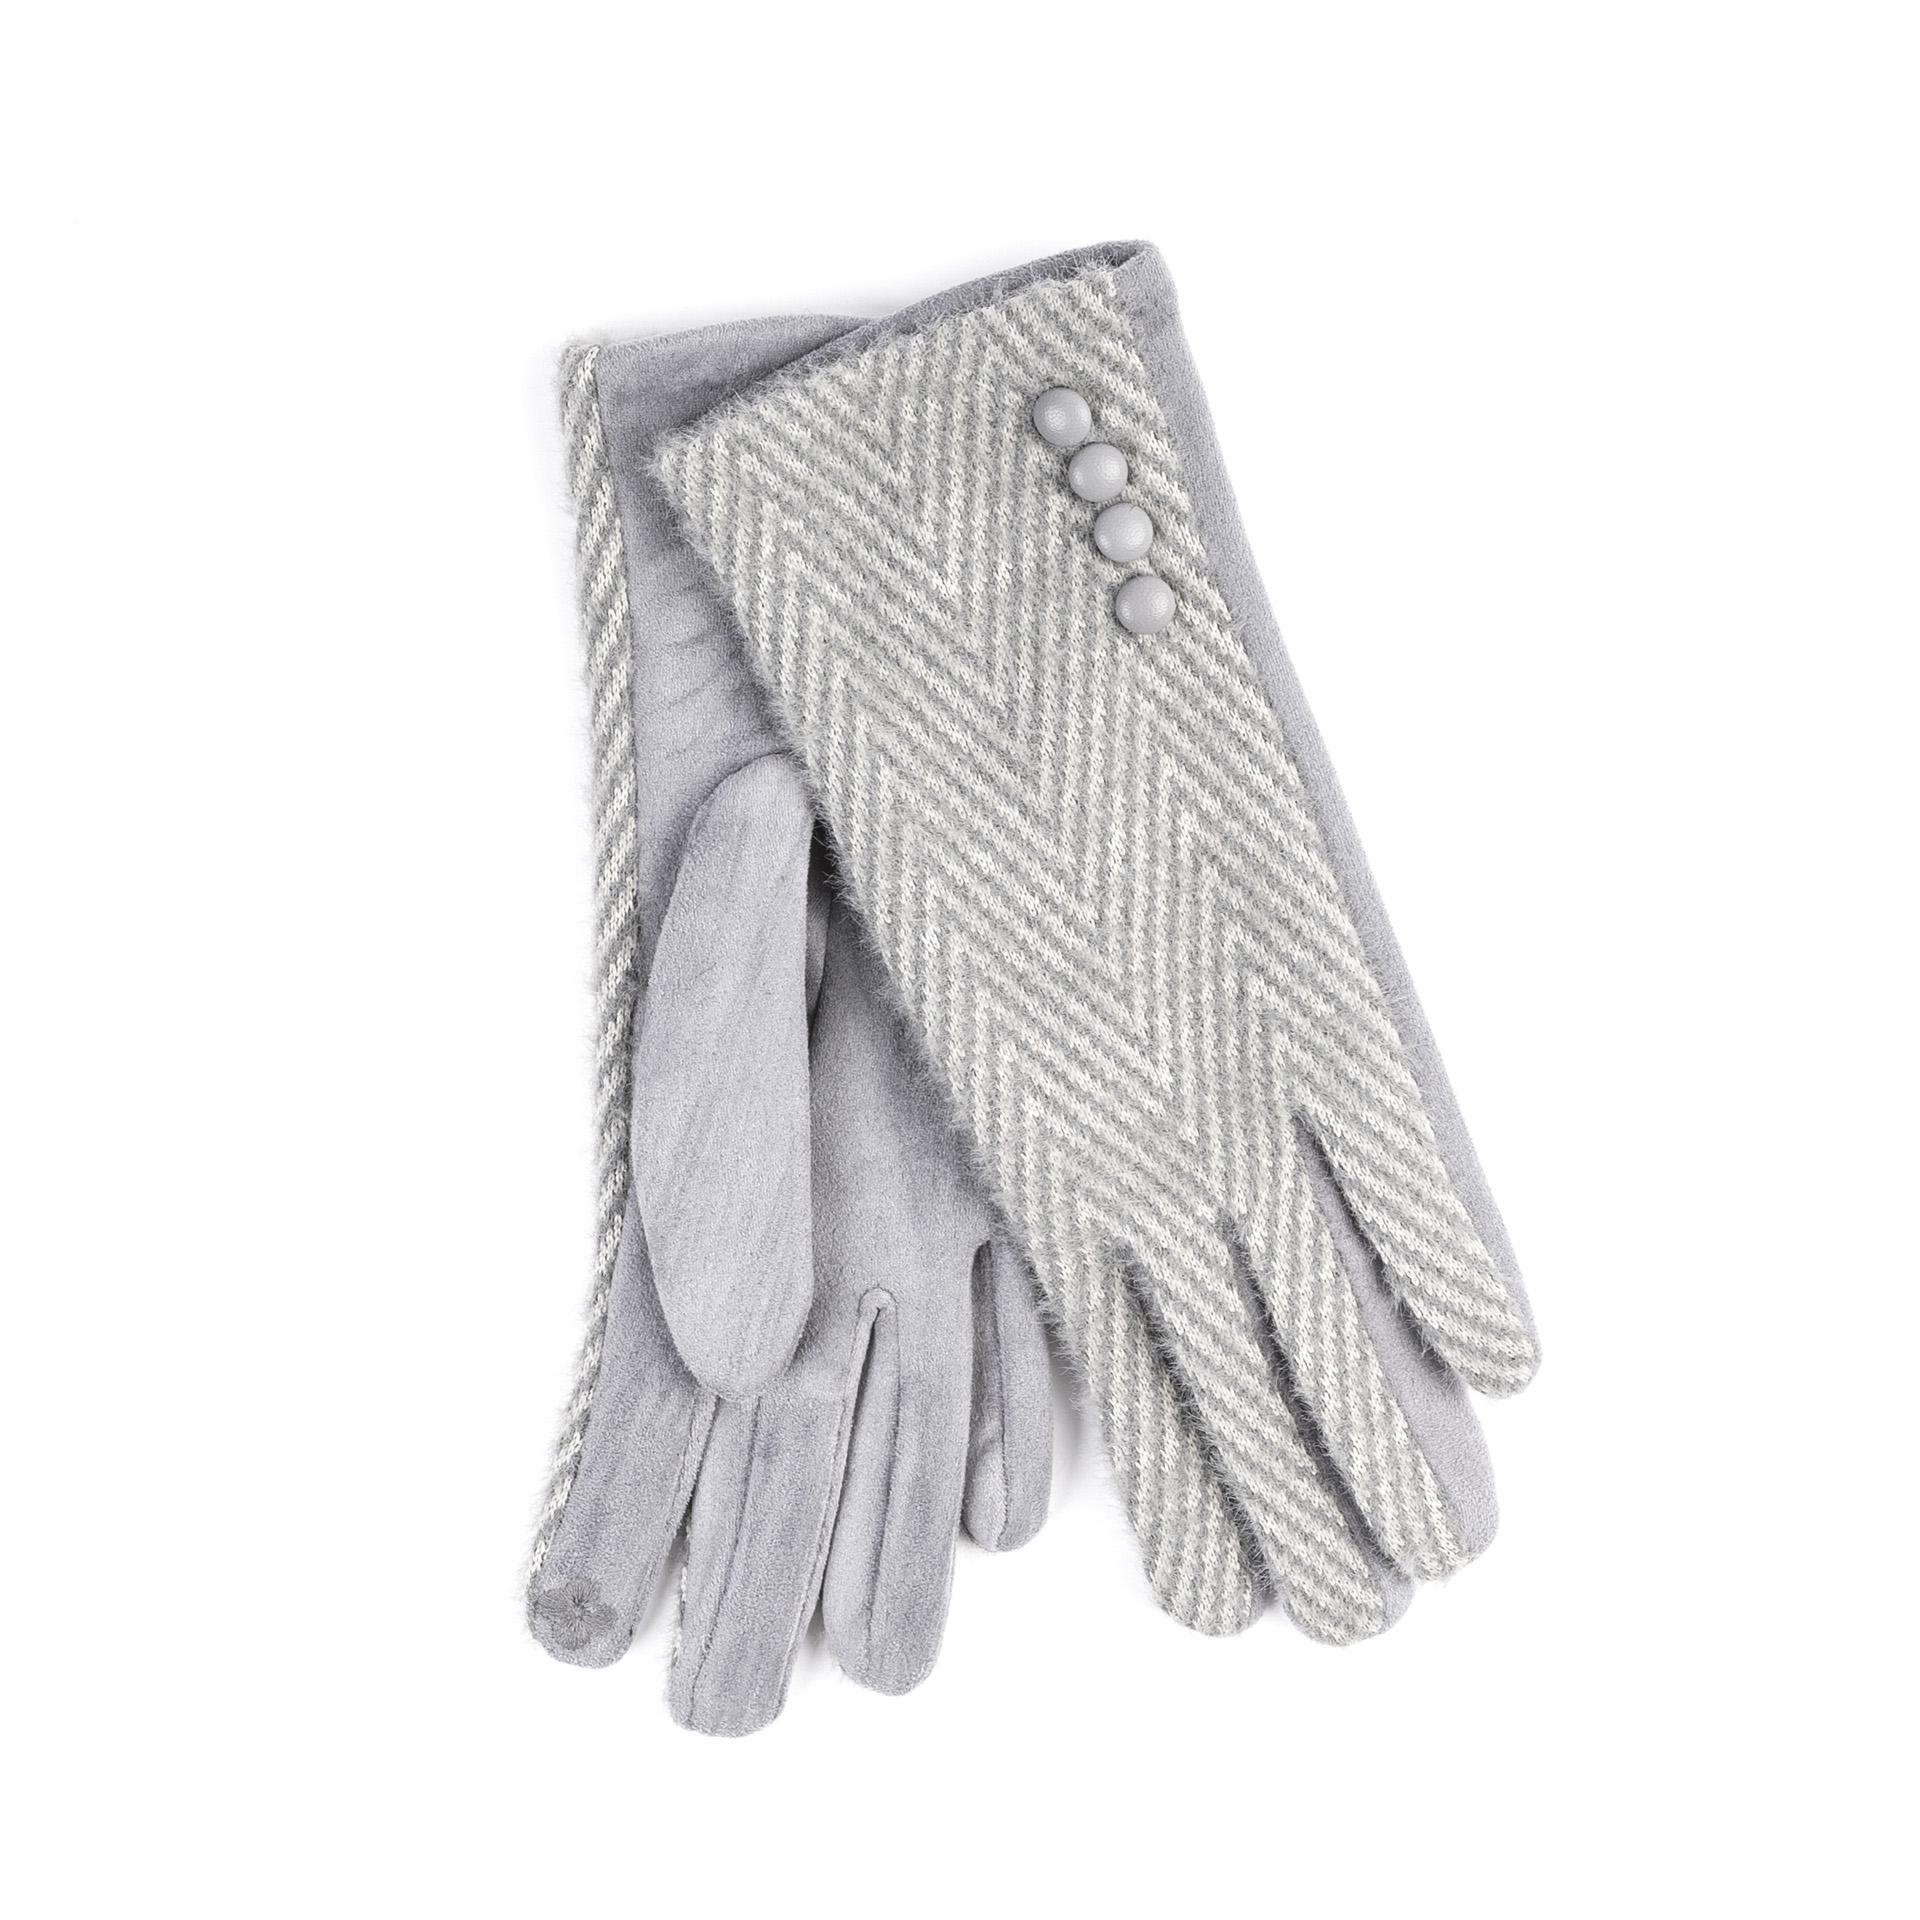 Heritage Super Soft Herringbone Button Glove - Silver